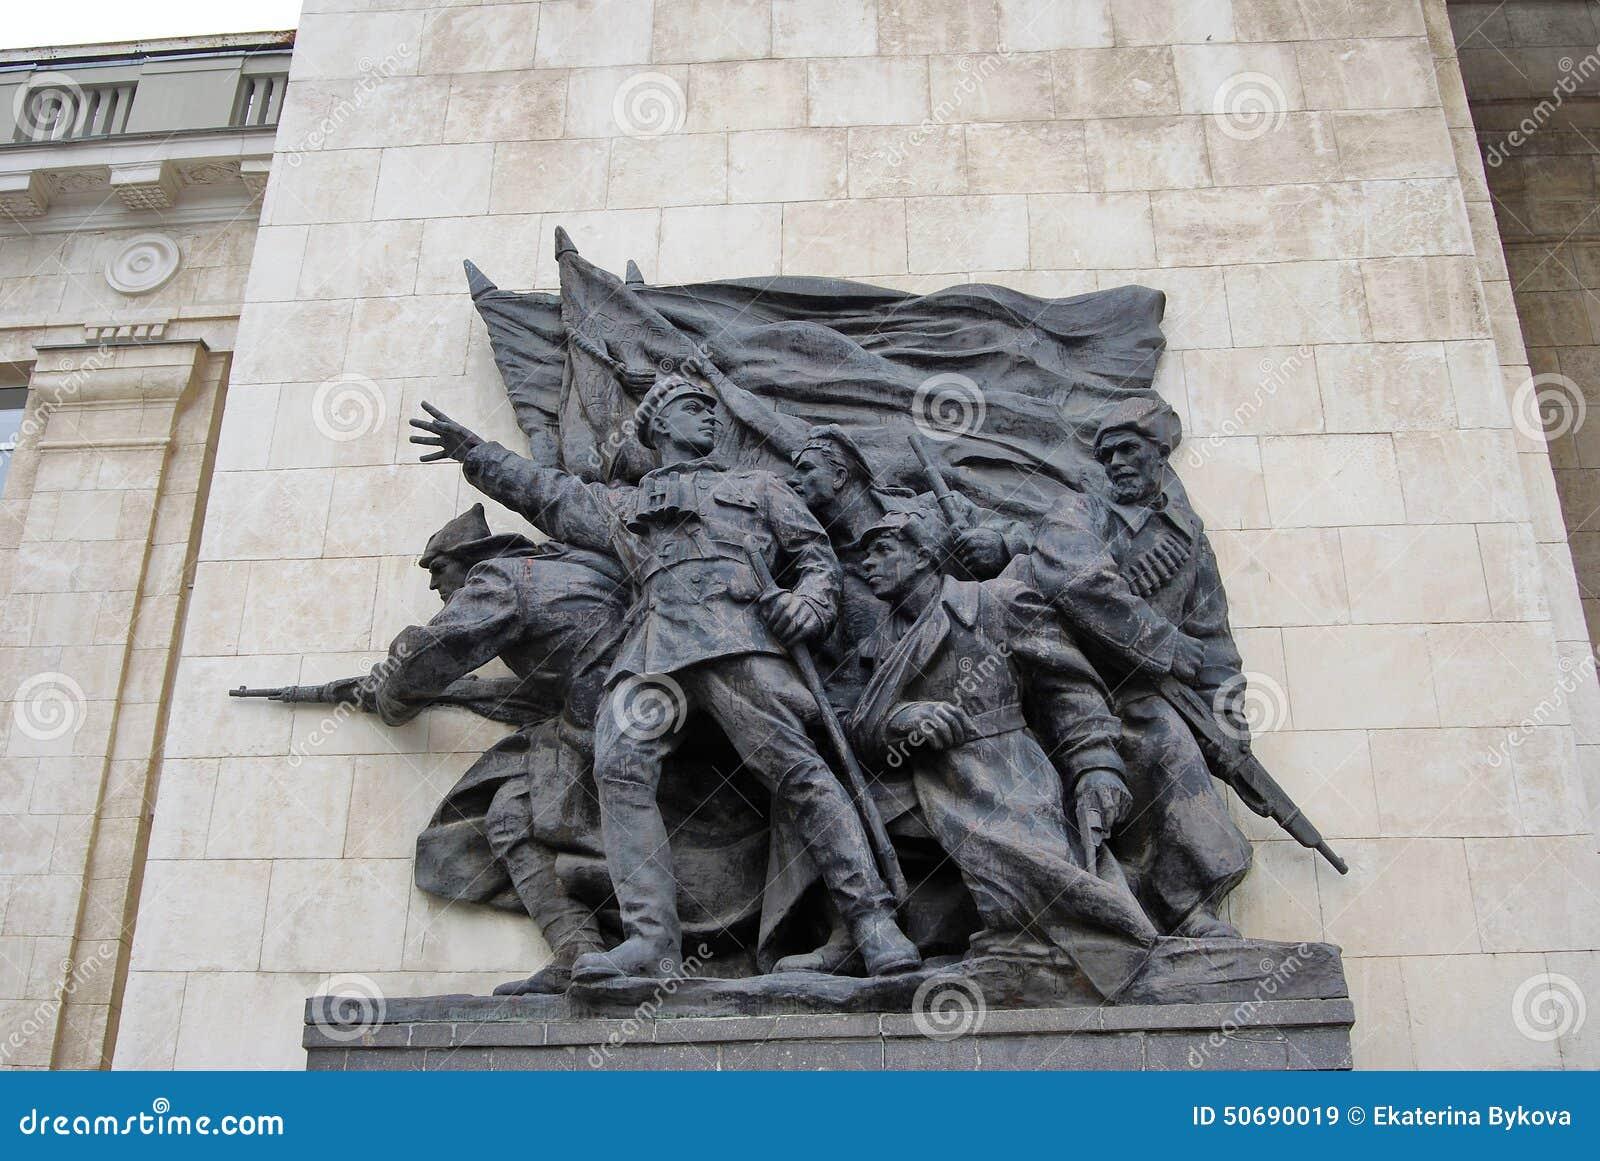 Download 苏联士兵雕塑 库存图片. 图片 包括有 构成, 扶手, 装饰, 军事, 地标, 俄国, 其次, 活动家, 投反对票 - 50690019